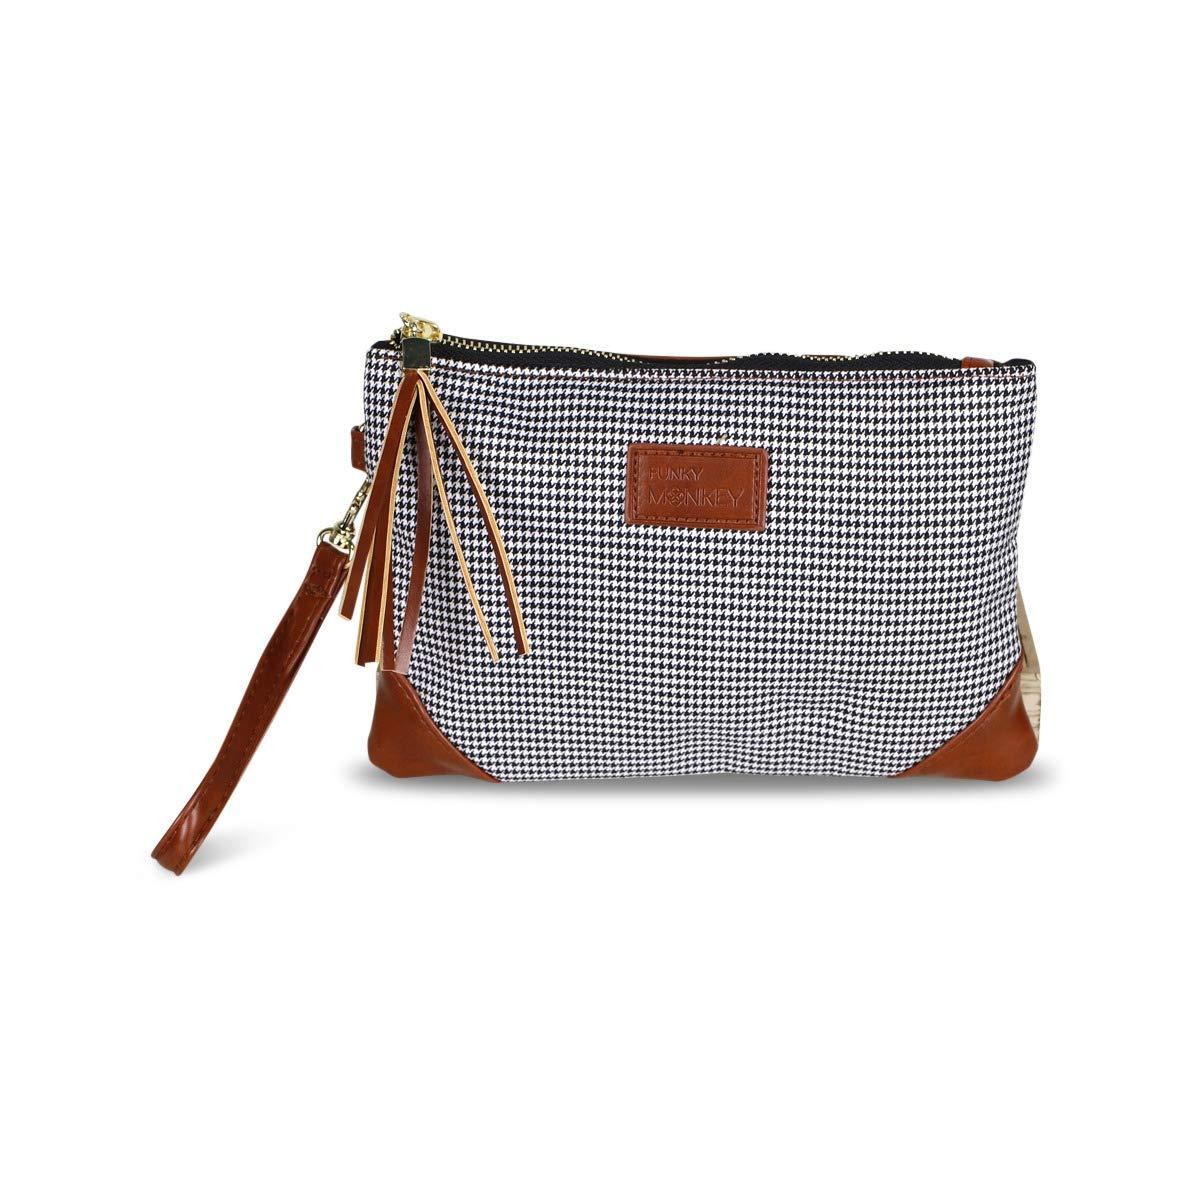 Corner Detail Vegan Tartan Wristlet Wallet Clutch Bag Phone Purse Handbag Funky Monkey Fashion